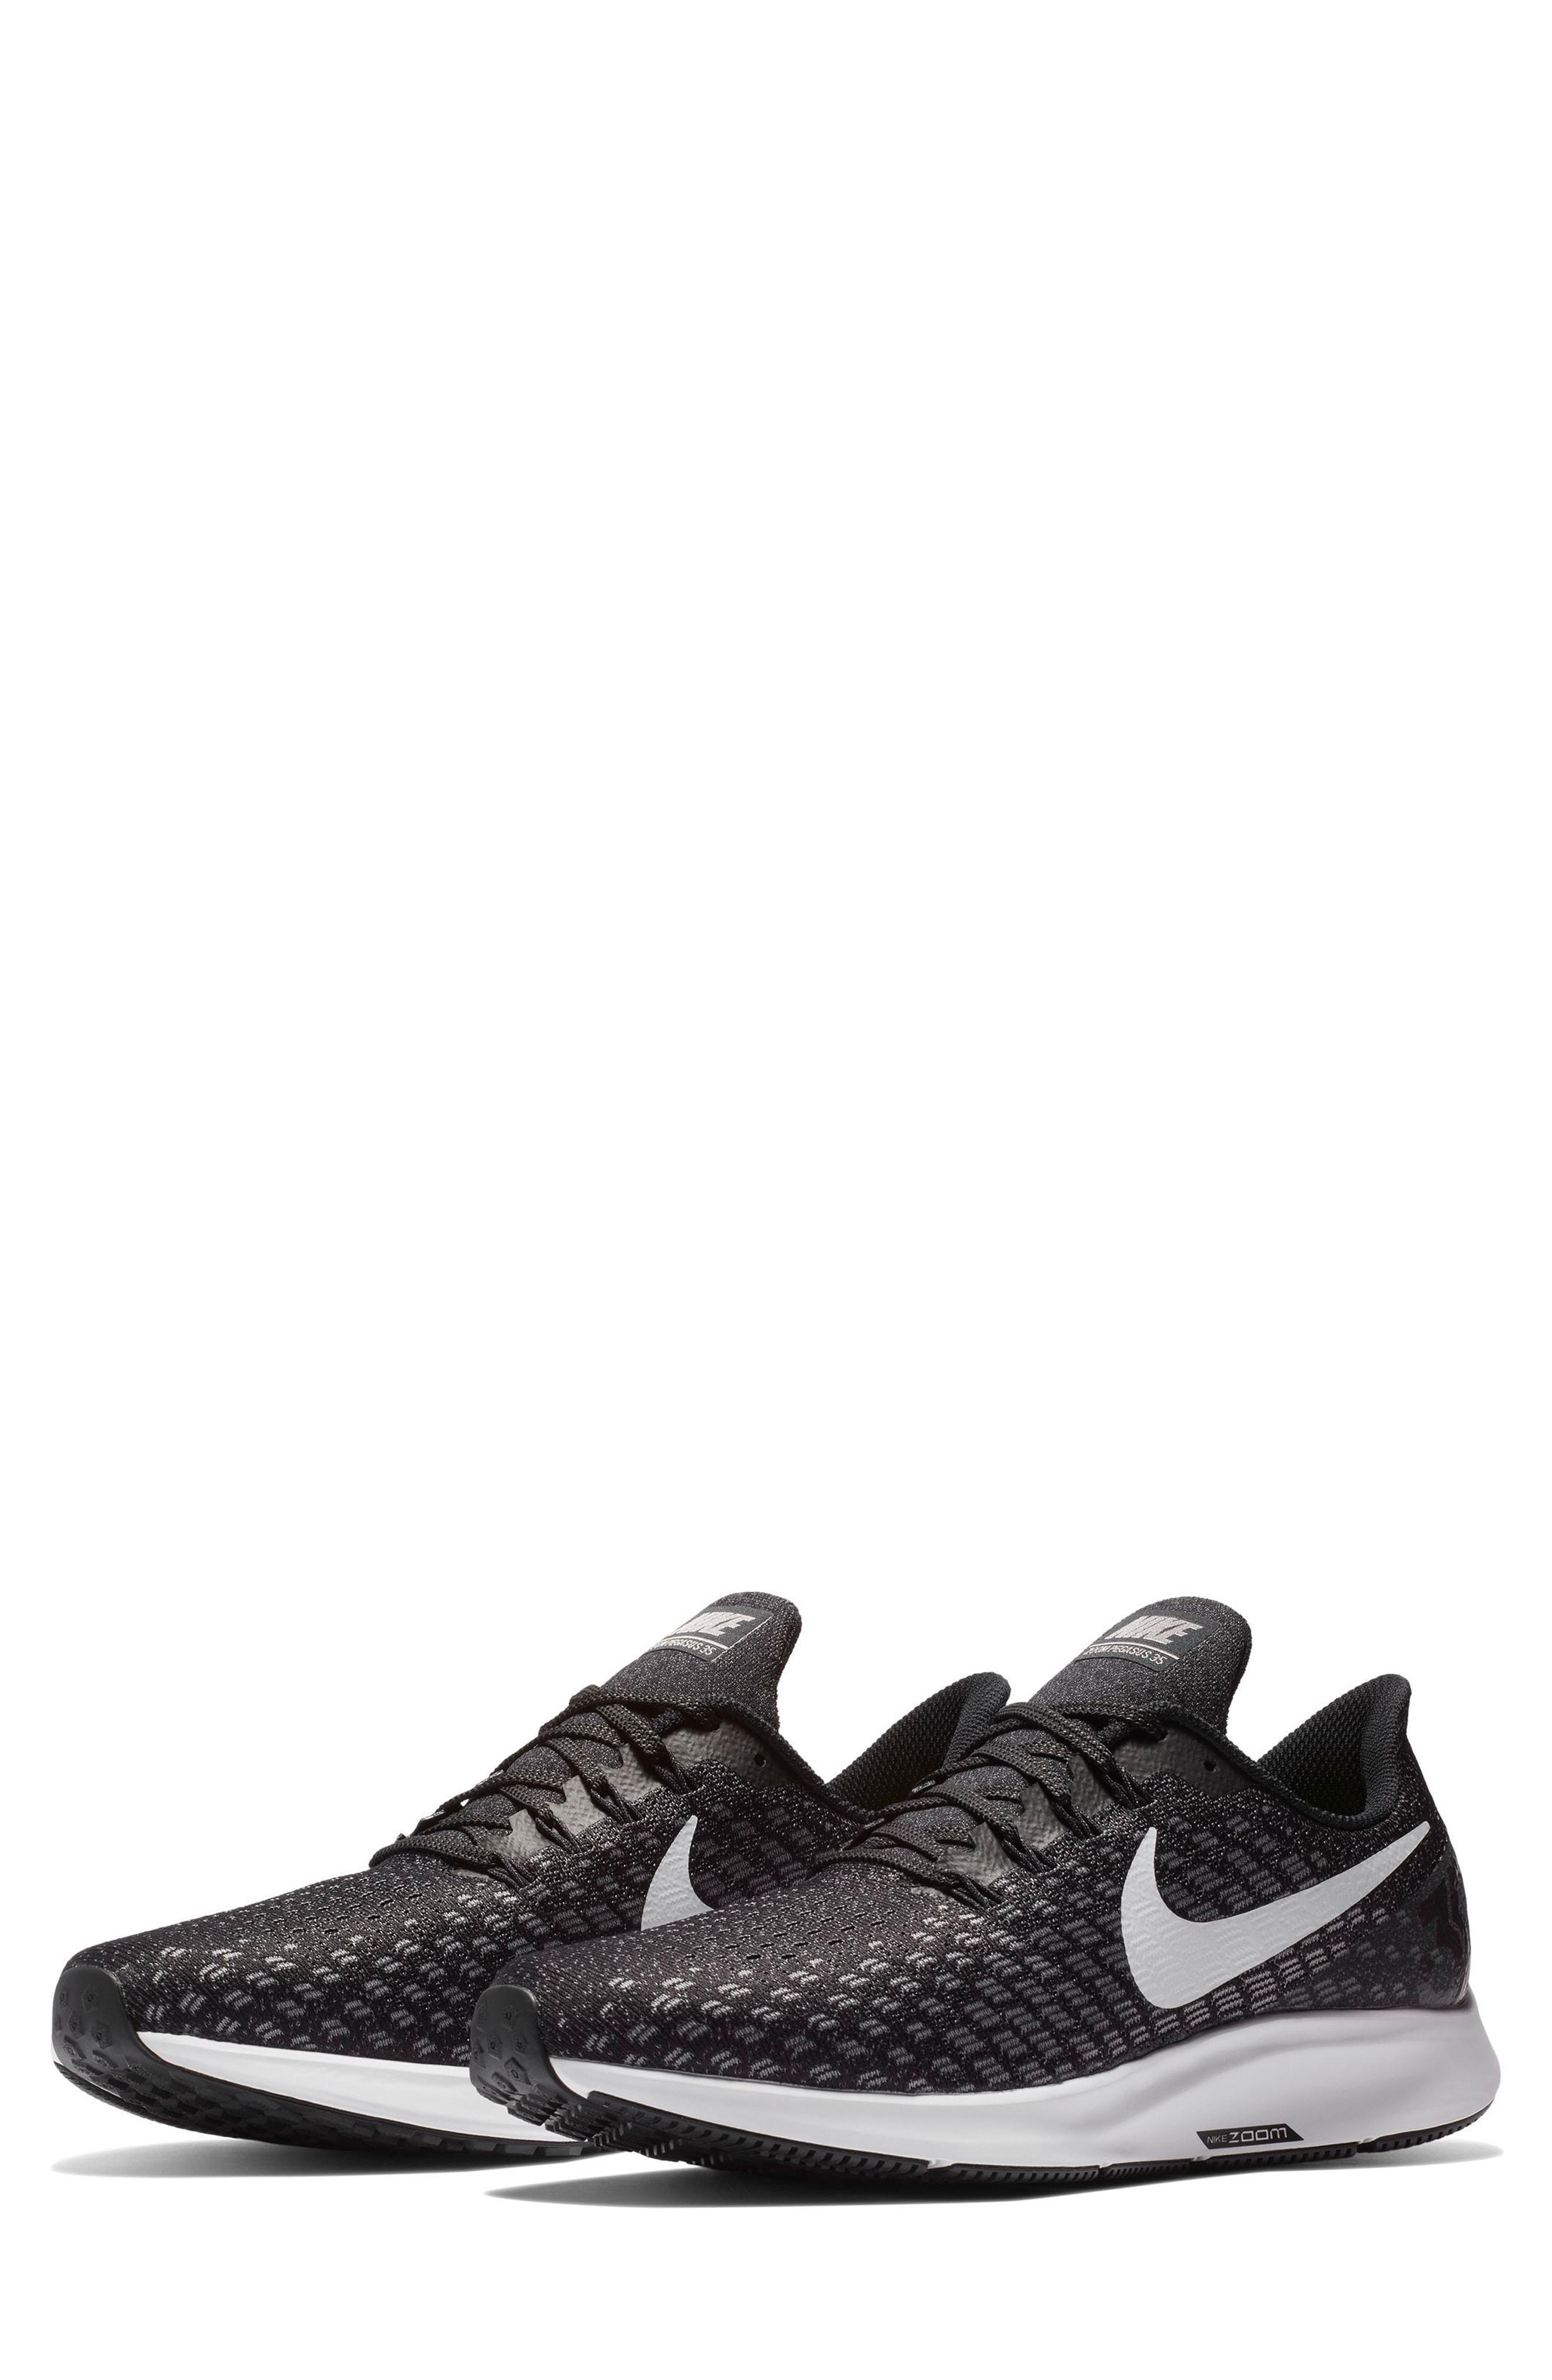 b86fc6cab72 Lyst - Nike Air Zoom Pegasus 35 Running Shoe in Blue for Men